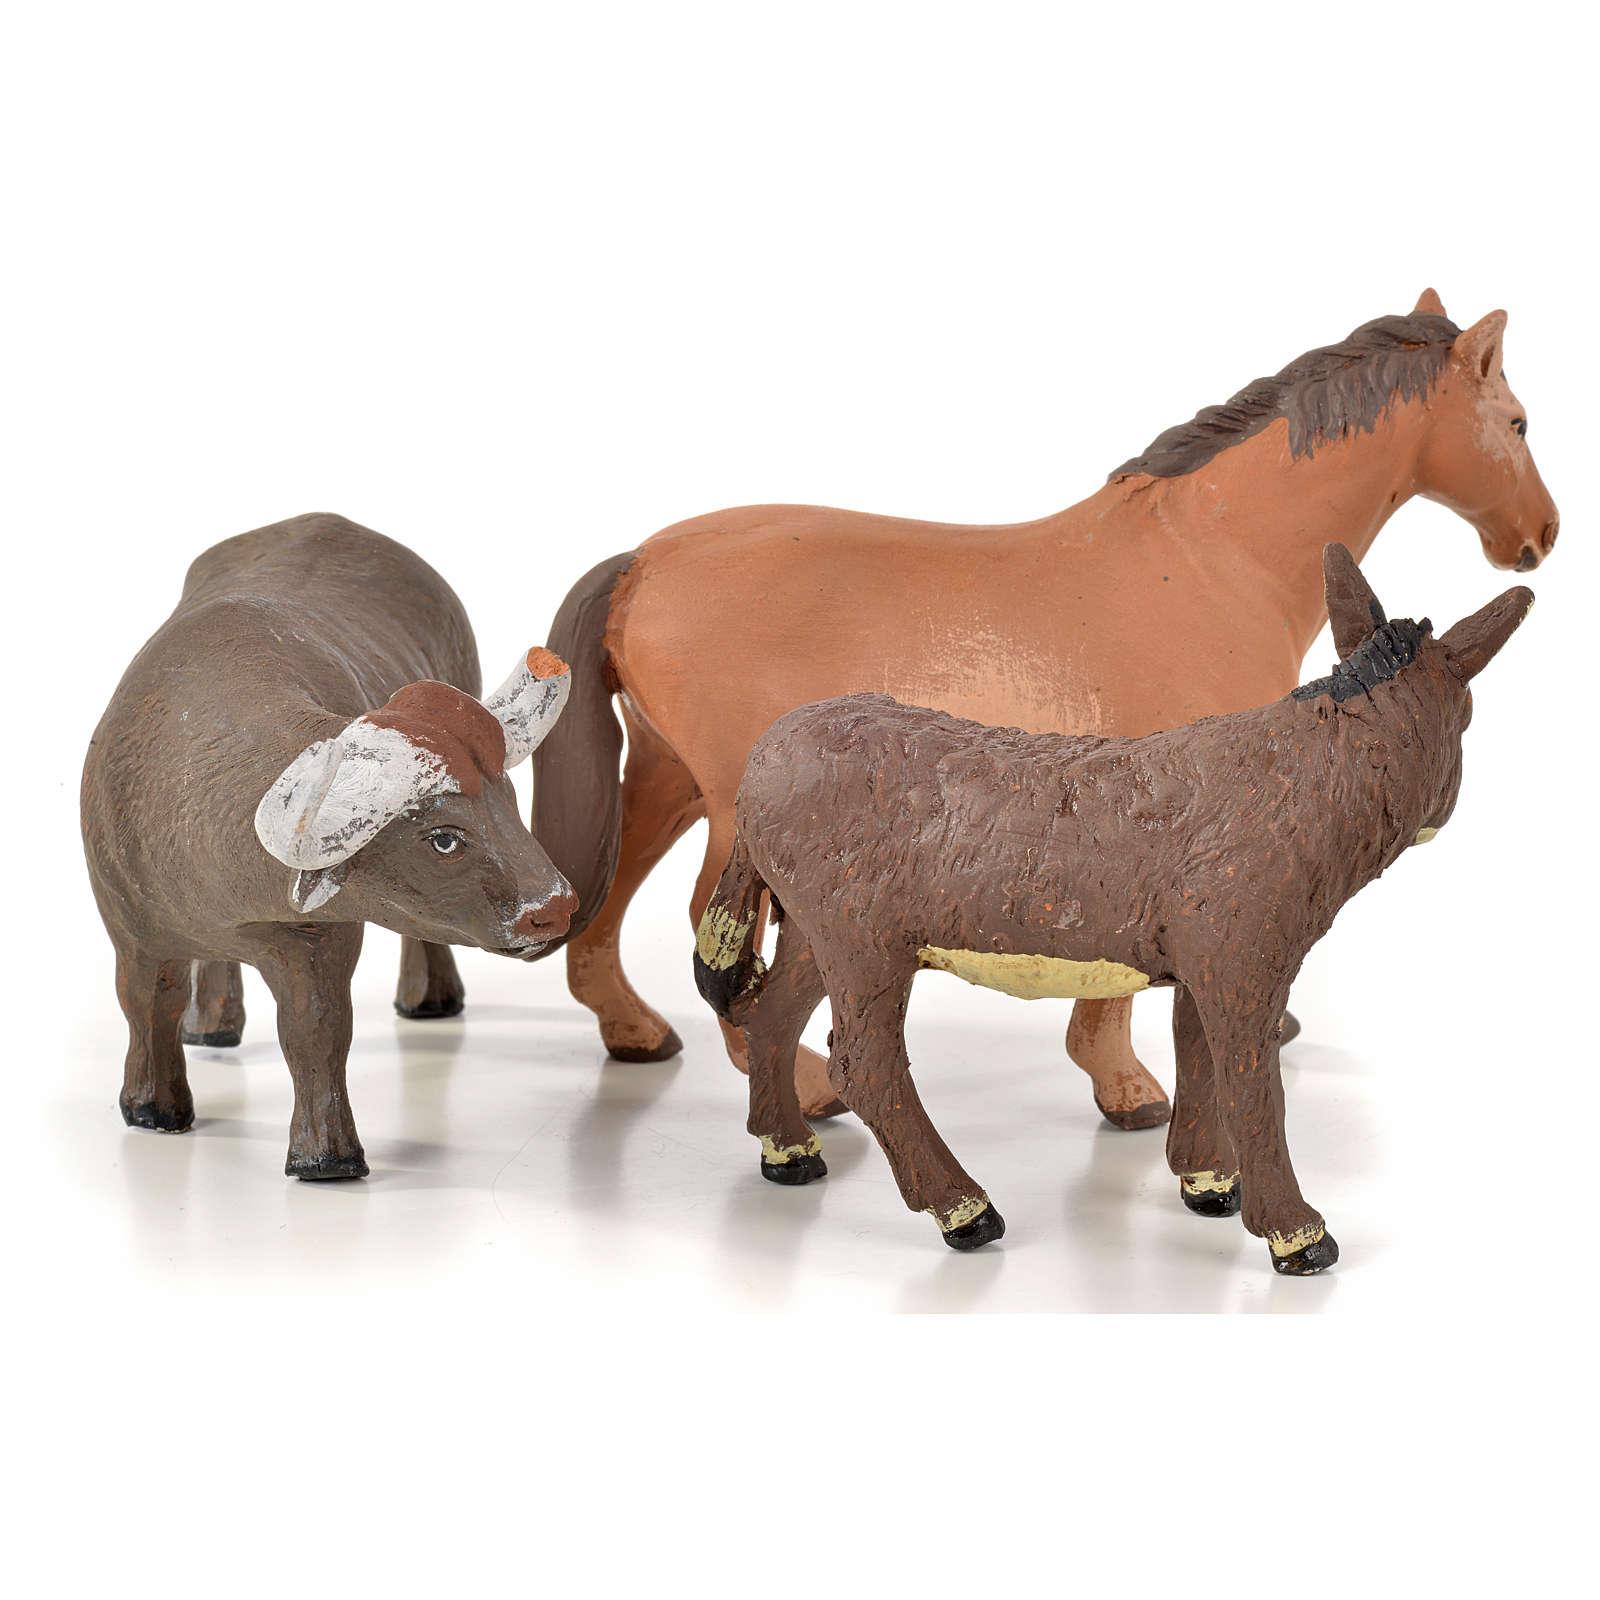 Neapolitan Nativity scene figurine, horse, donkey and buffalo 10 4